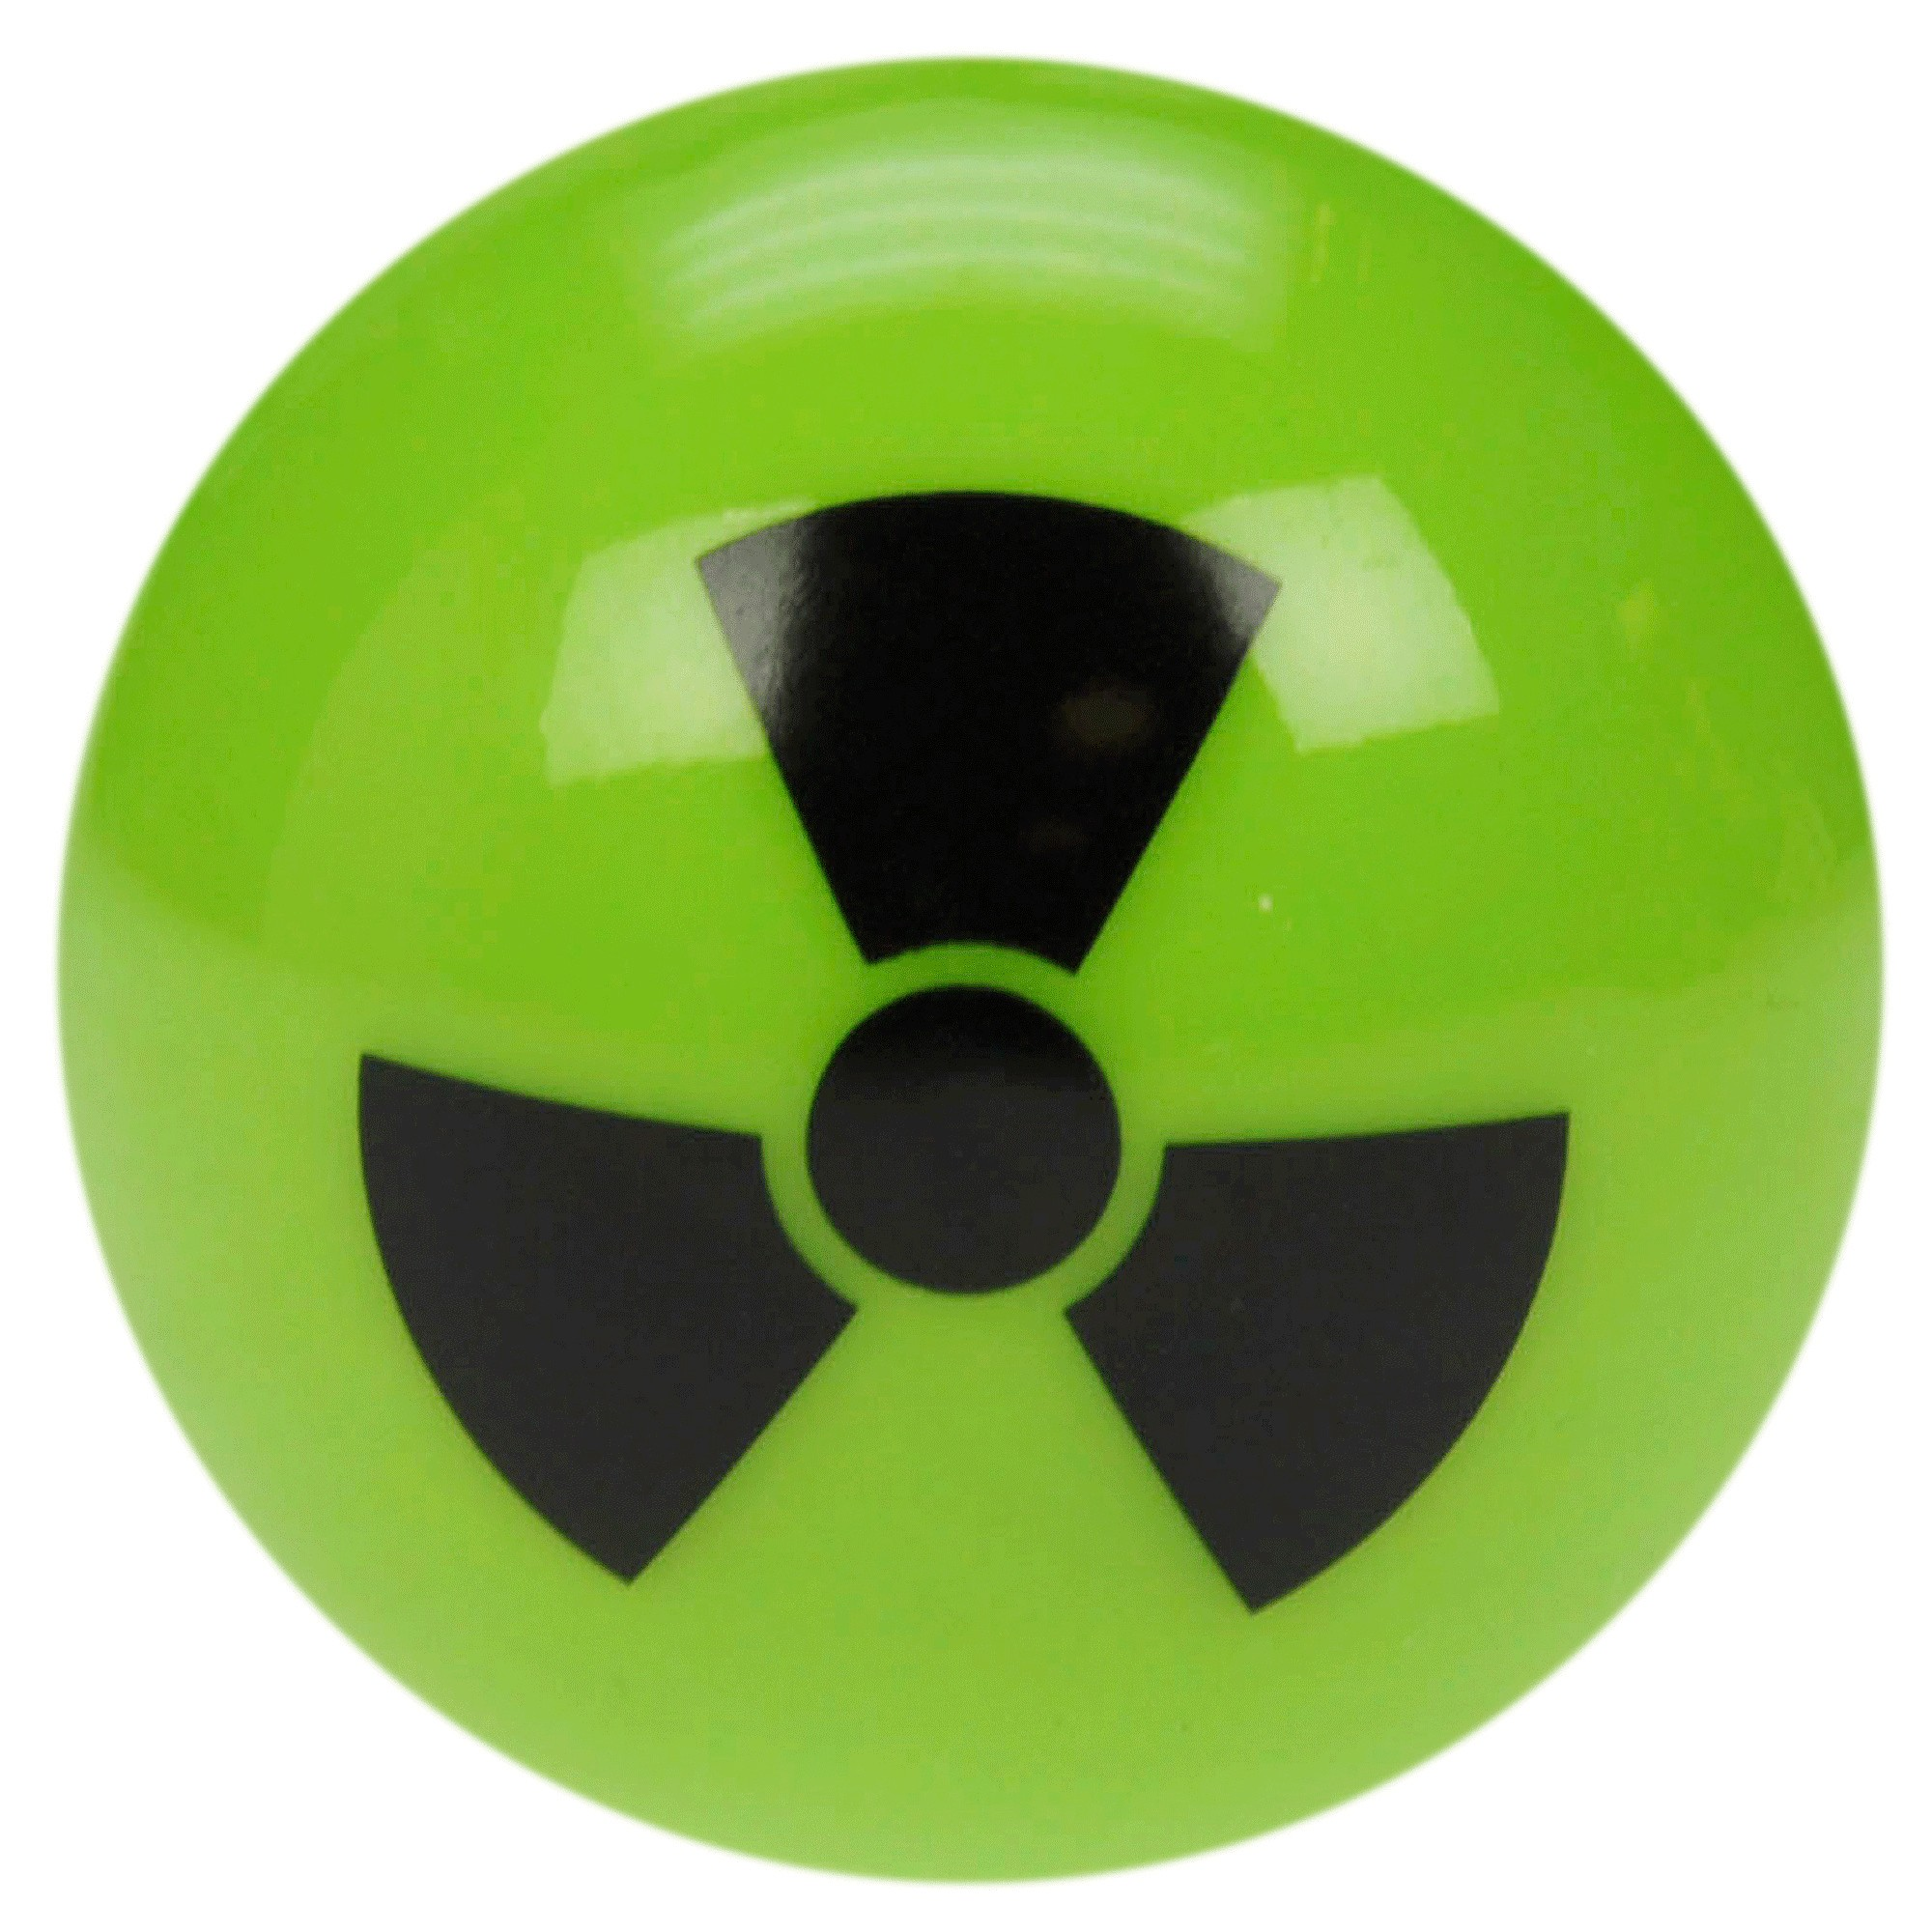 Sof Sole Radioactive Sneaker Balls